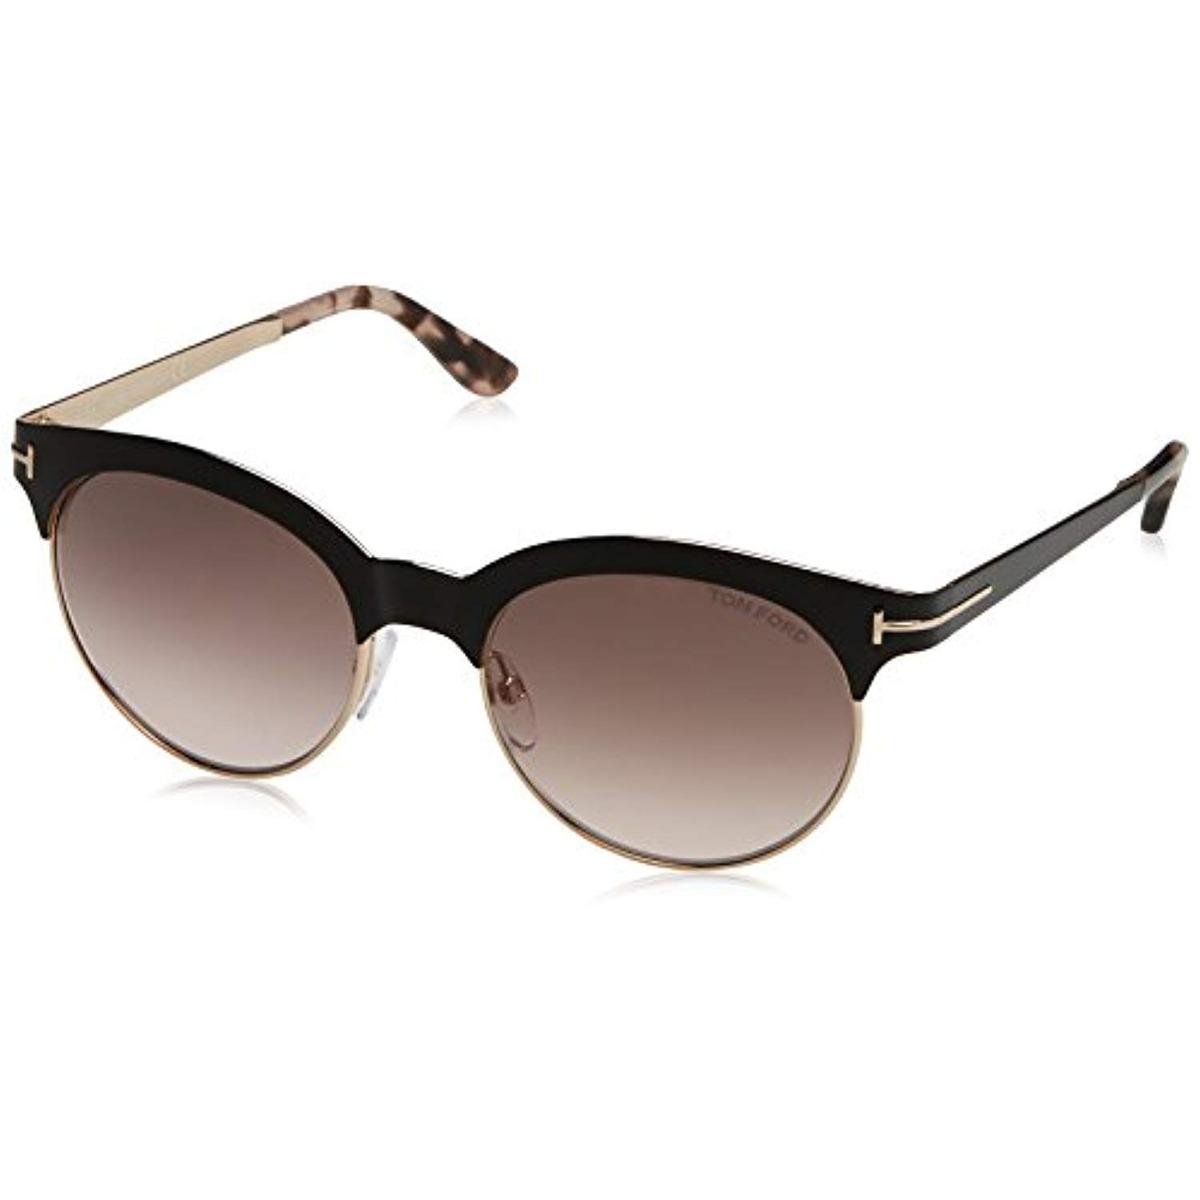 c4578741e4 Gafas De Sol Tom Ford Tf 438 Angela 01f Tortuga - $ 660.533 en ...